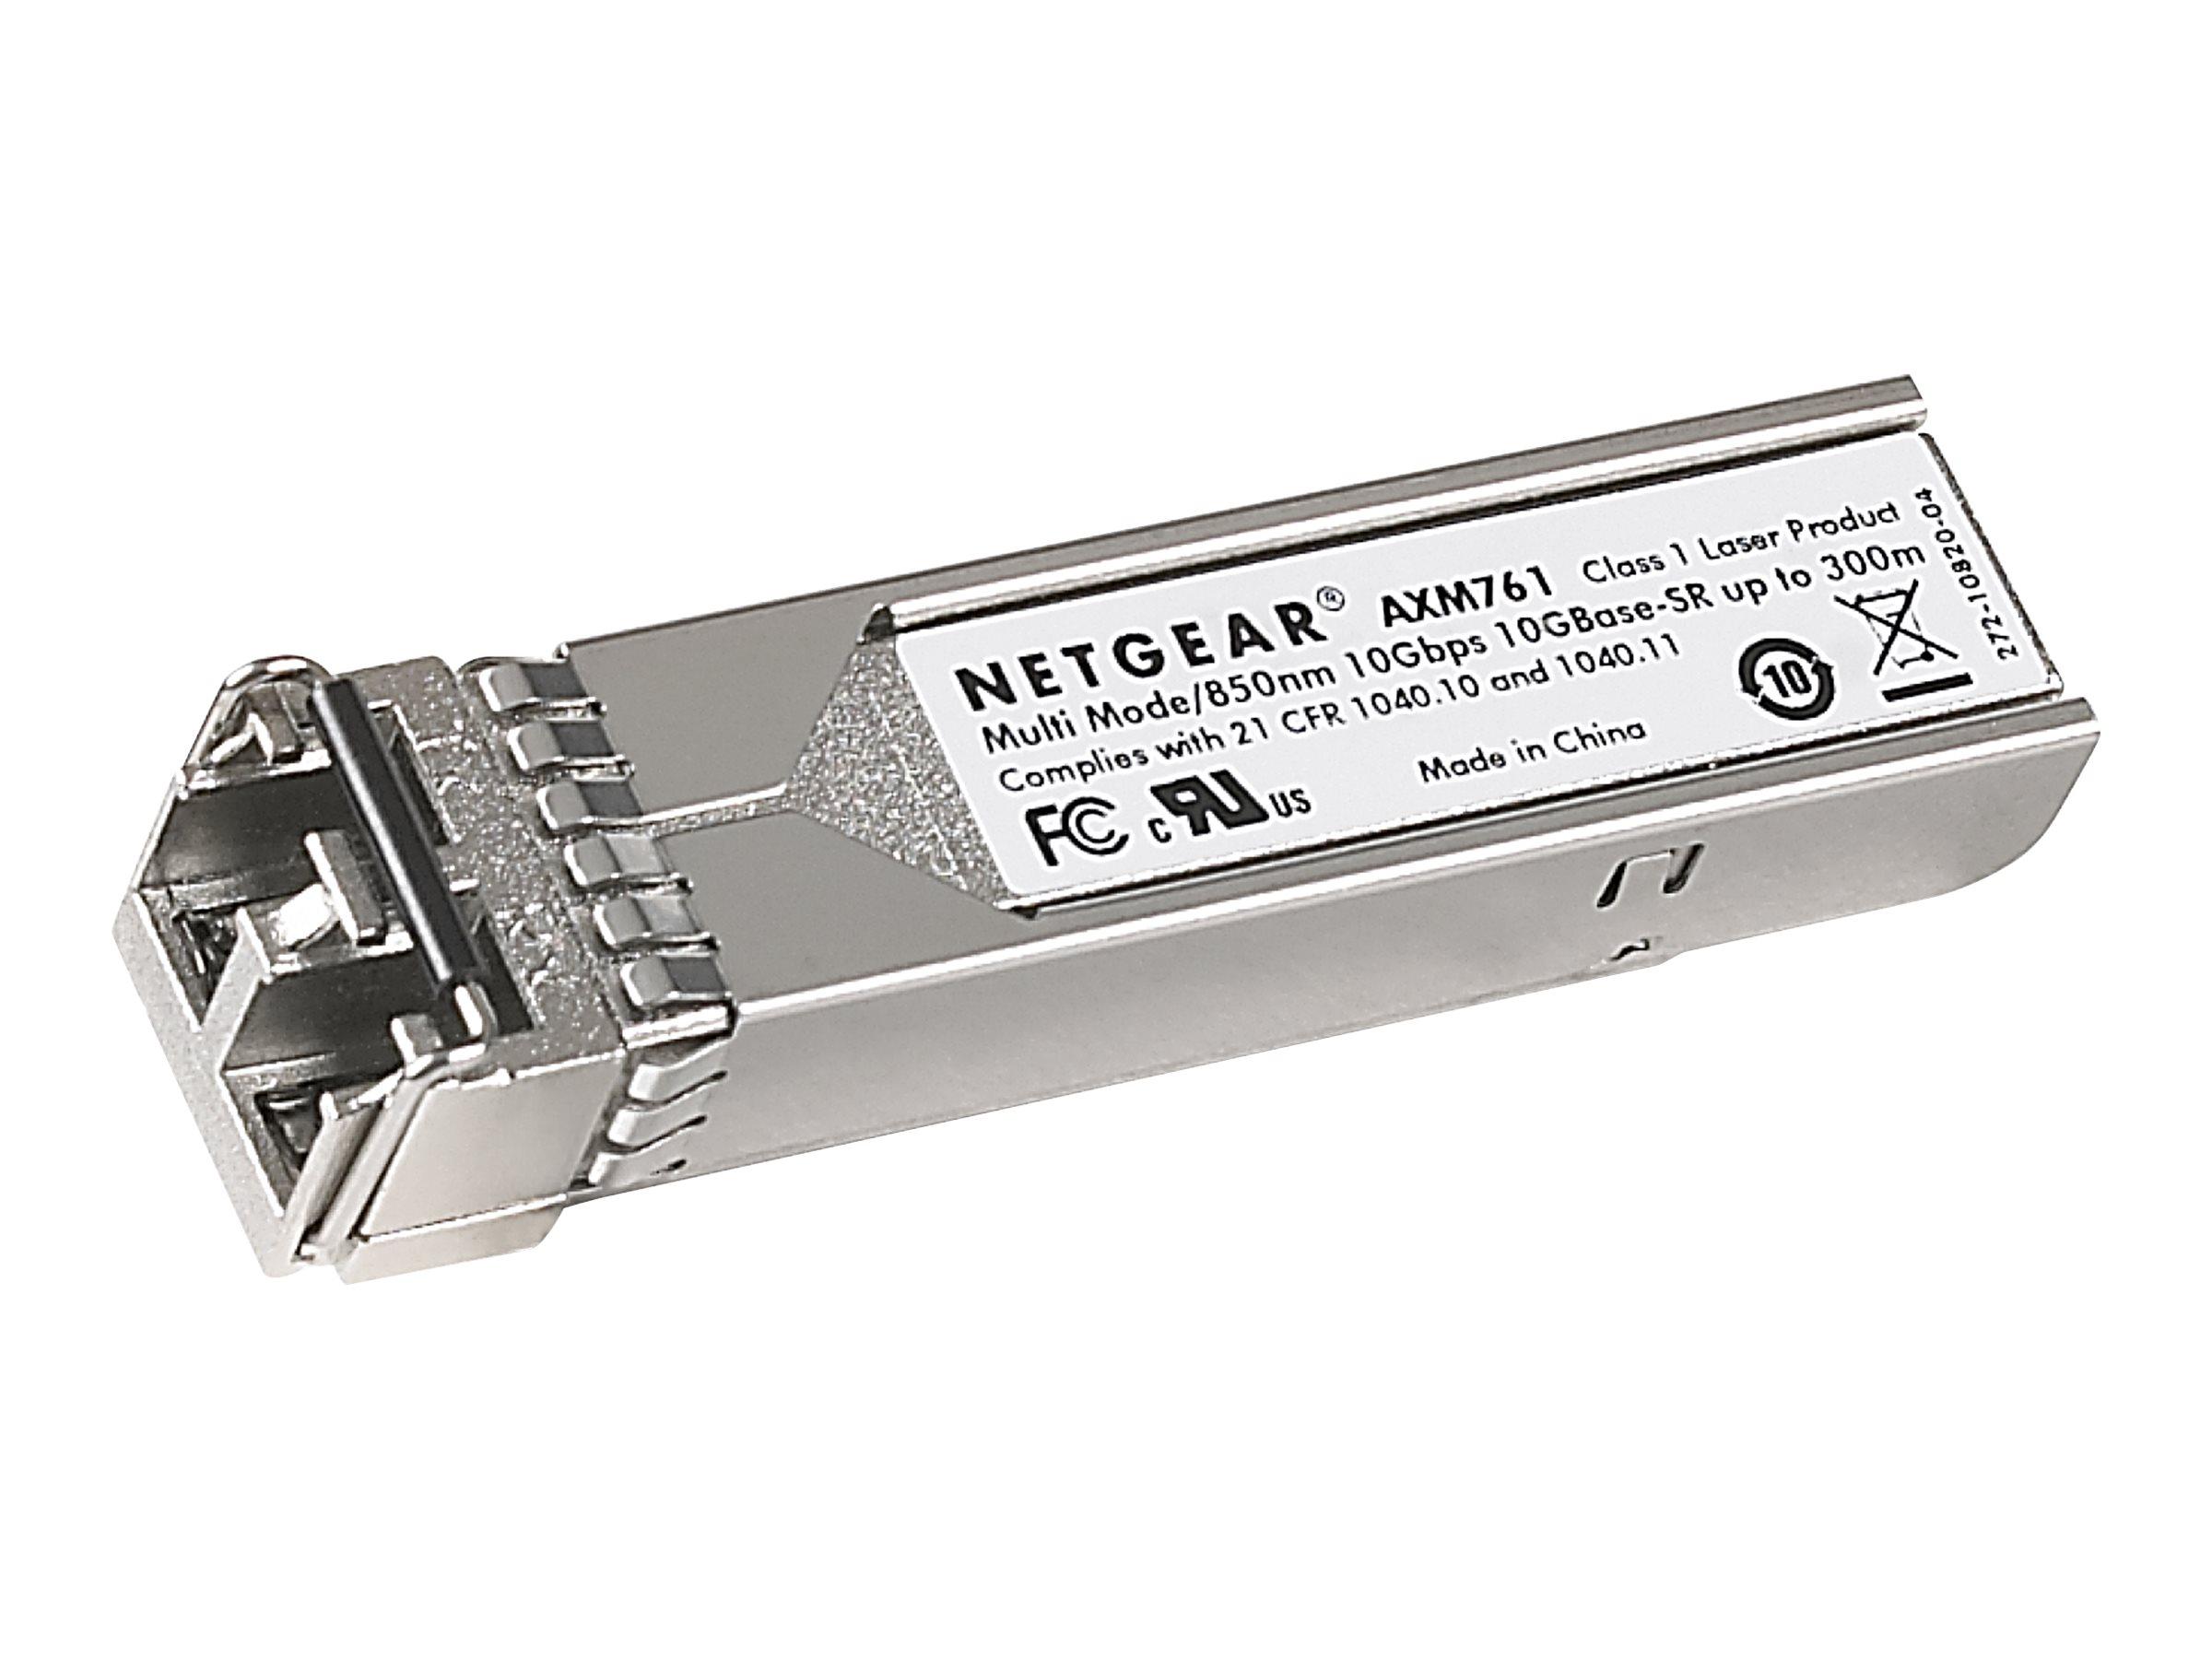 NETGEAR ProSafe AXM761 - SFP+-Transceiver-Modul - 10 GigE - 10GBase-SR - bis zu 300 m - für NETGEAR M4300-28G-PoE+